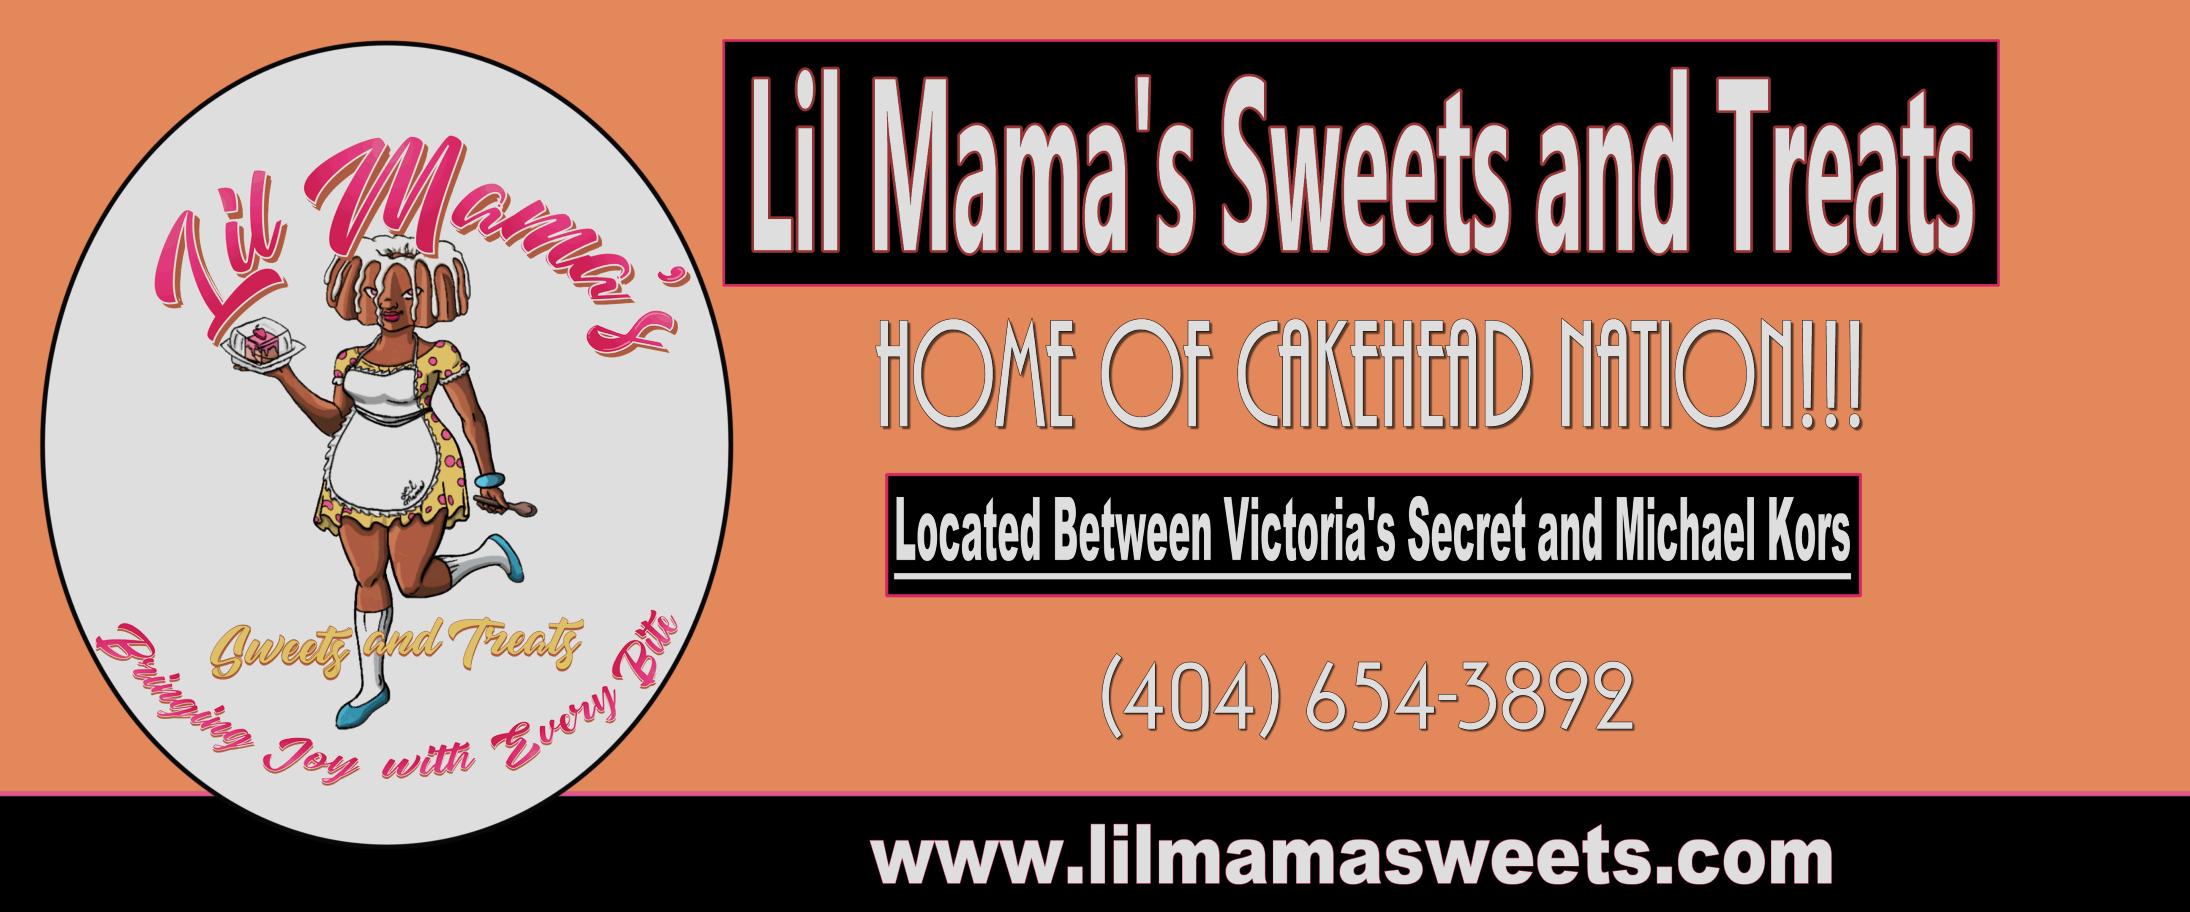 Lil Mama's Sweets & Treats